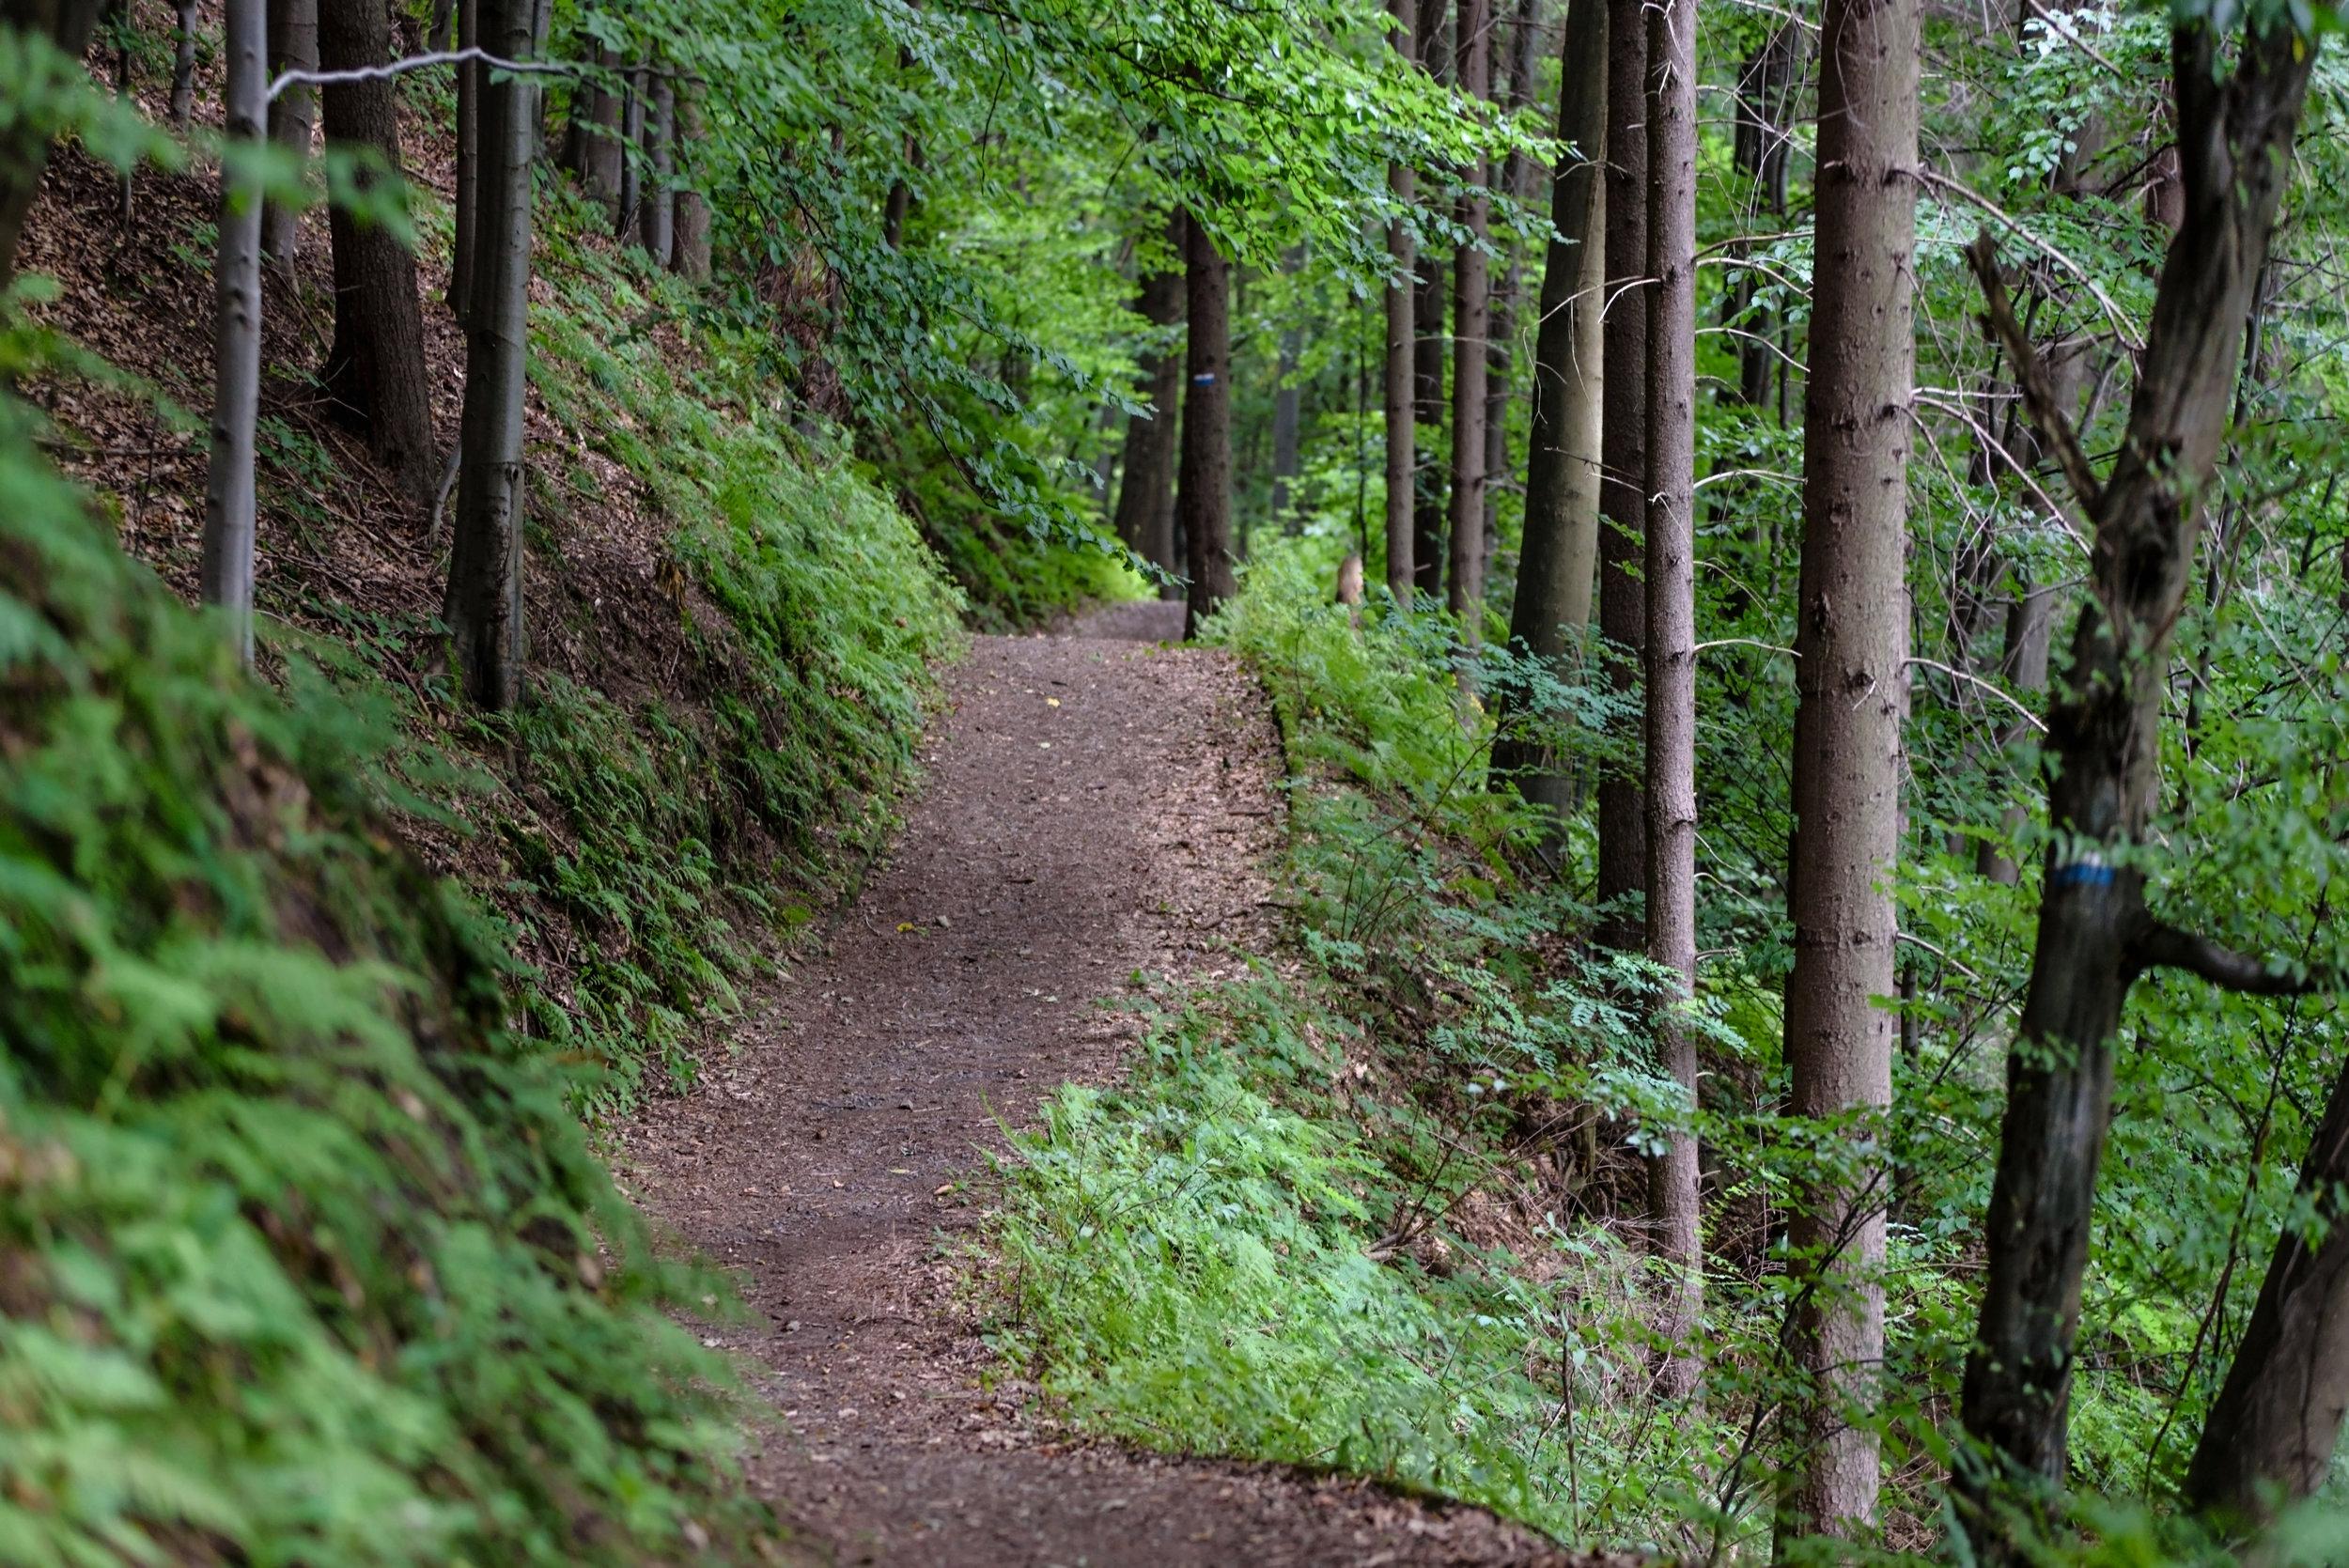 Canva - Forest Hiking Trail.jpg